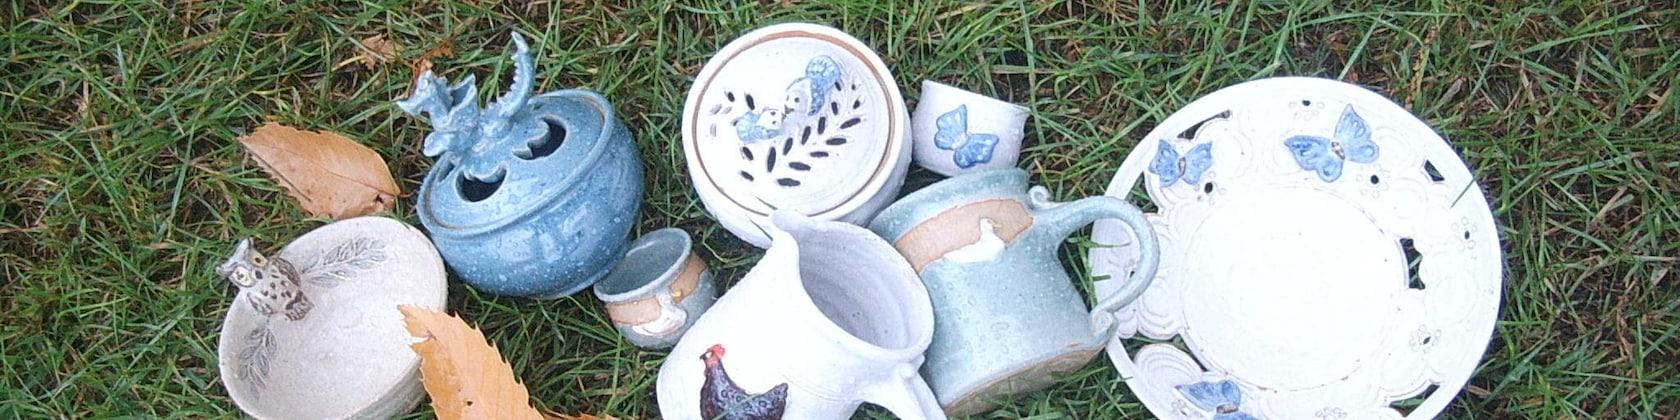 PAINT YOUR OWN DRAGON Pottery Kids Craft Activity 12cm X 11cm